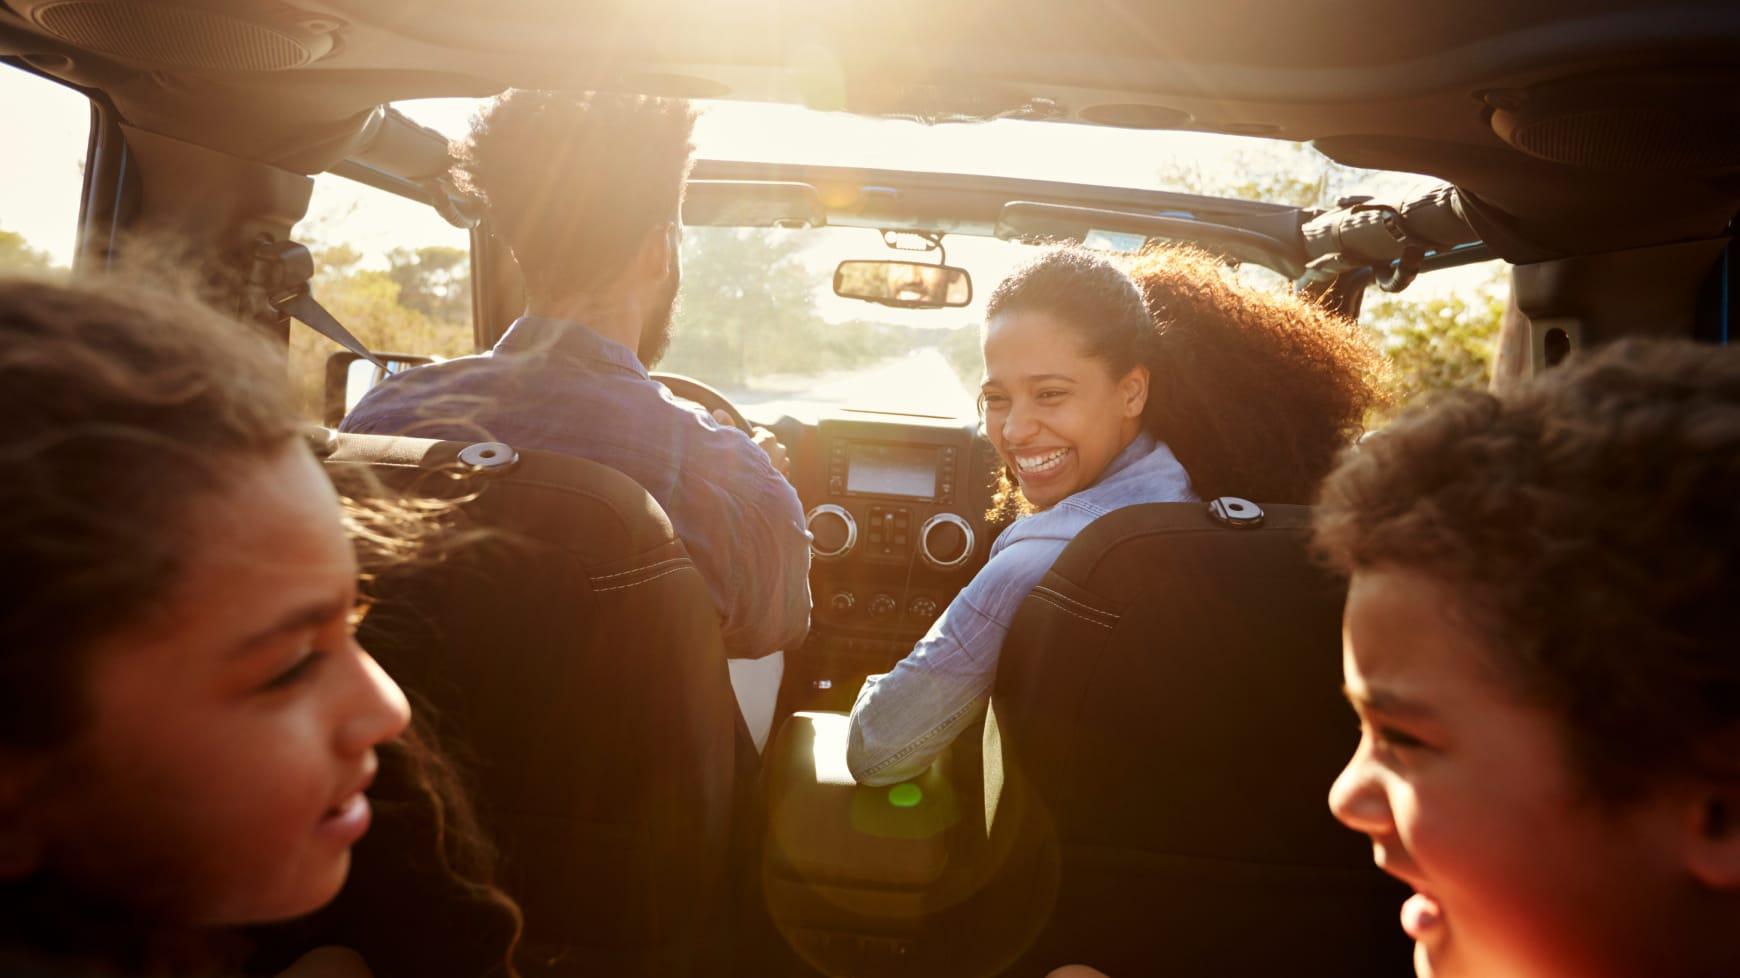 A family car ride